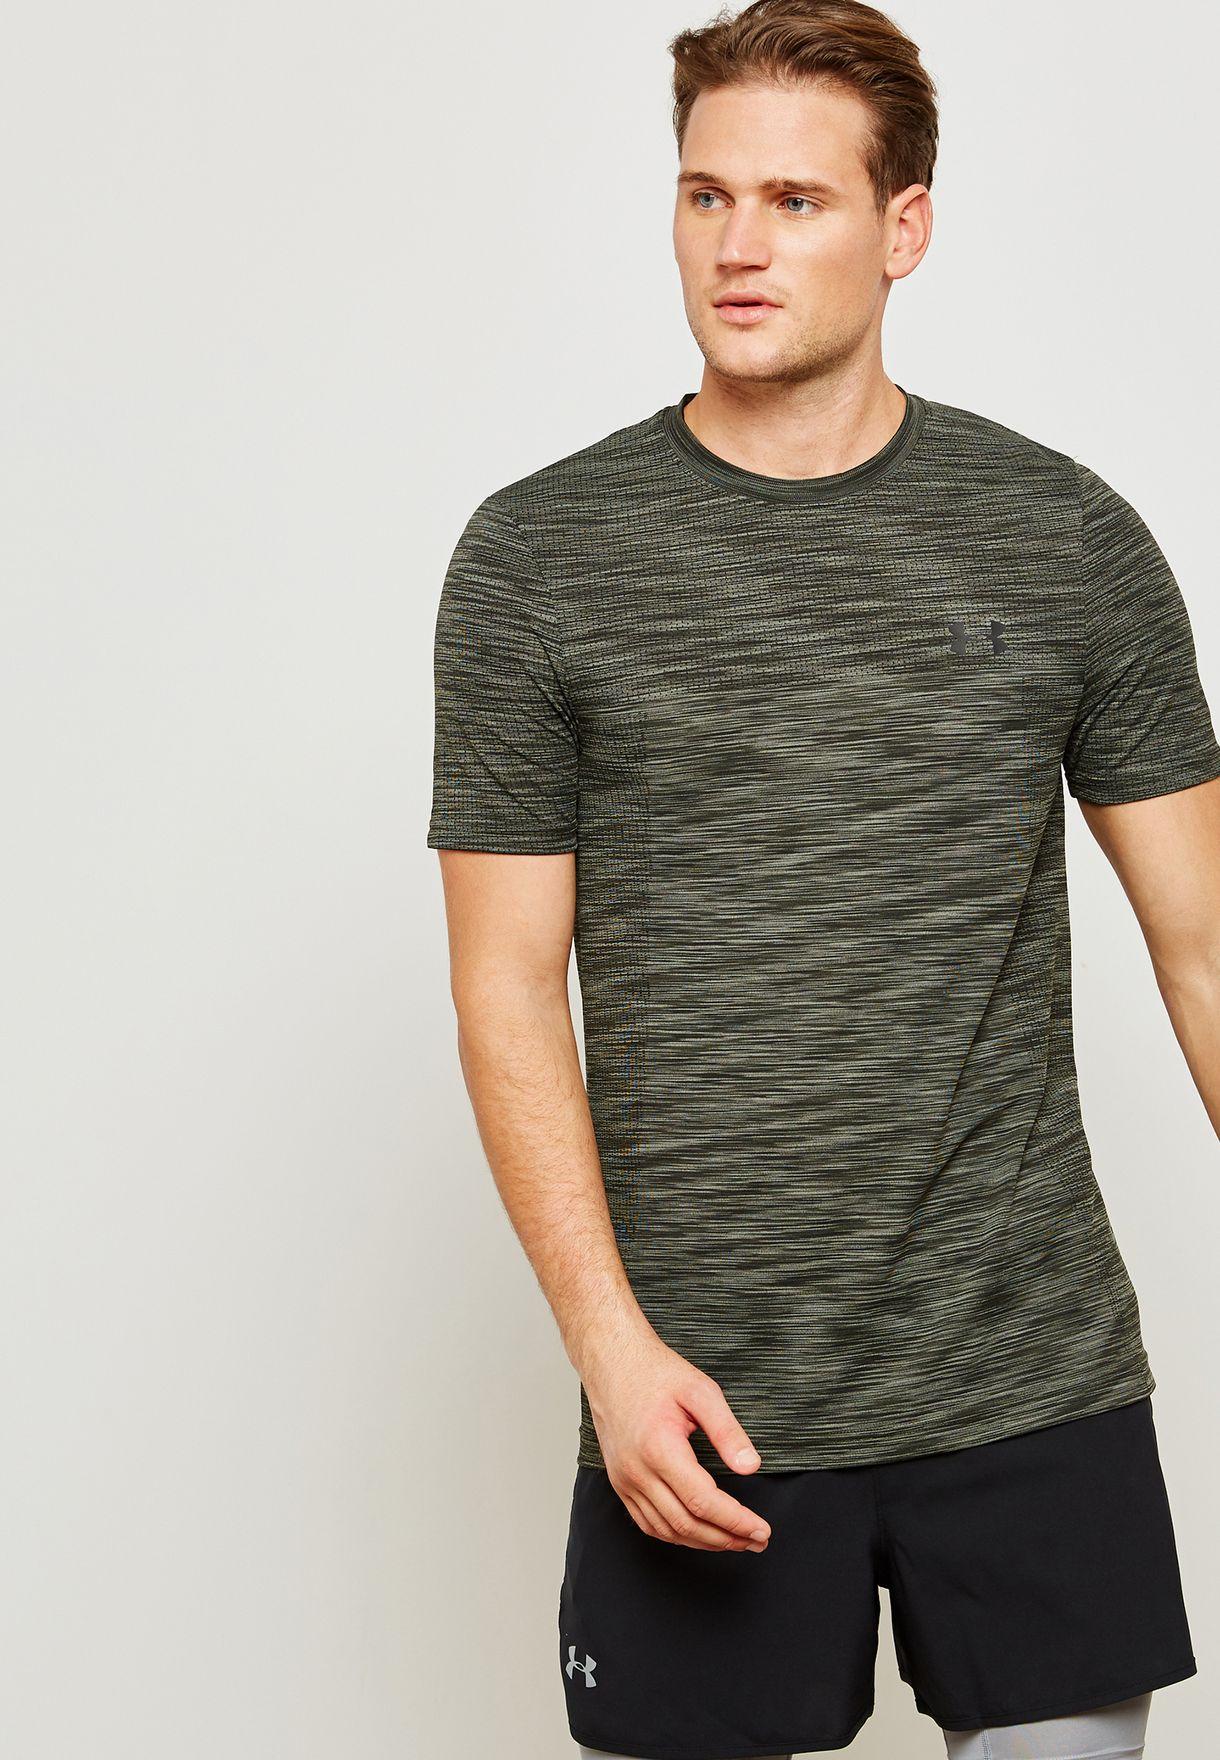 bala ex rima  Buy Under Armour green Siphon T-Shirt for Men in MENA, Worldwide    1325622-357